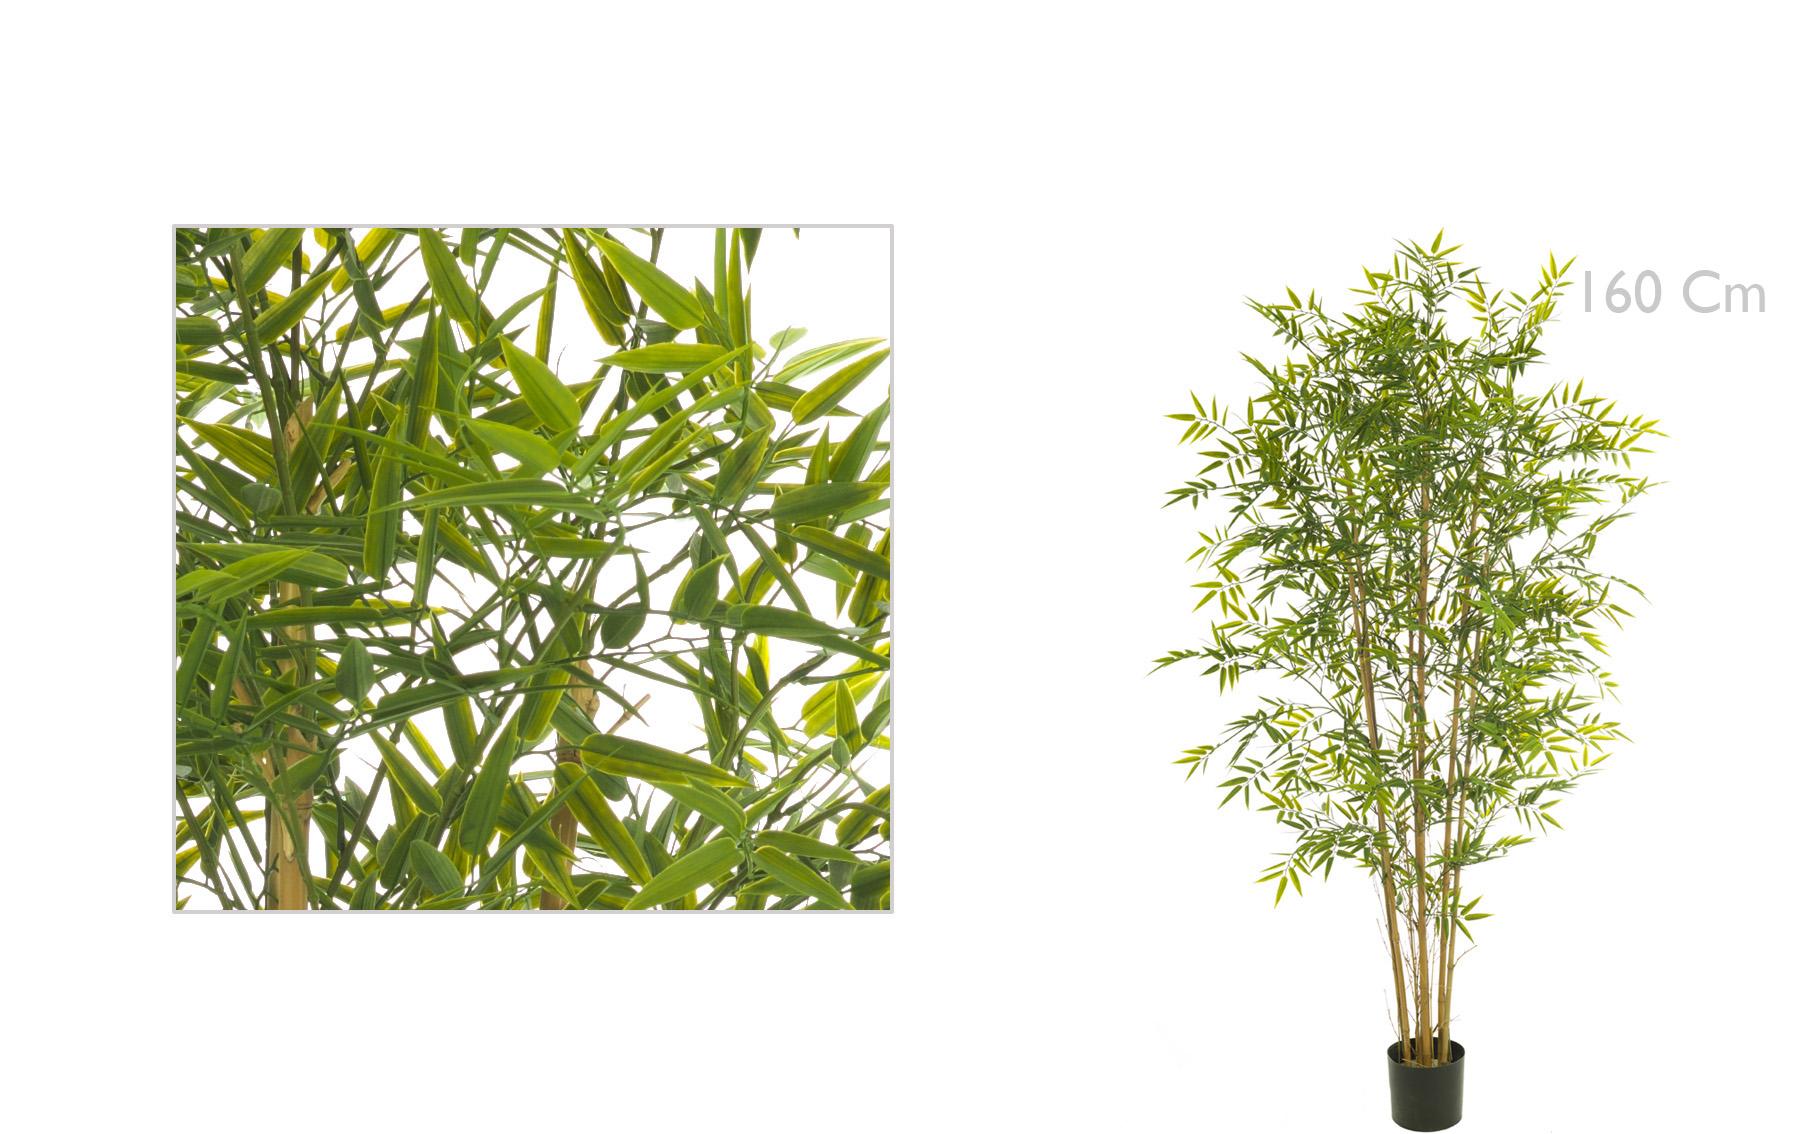 arbool  Bambu de 160cm www.floresymuchomas.com